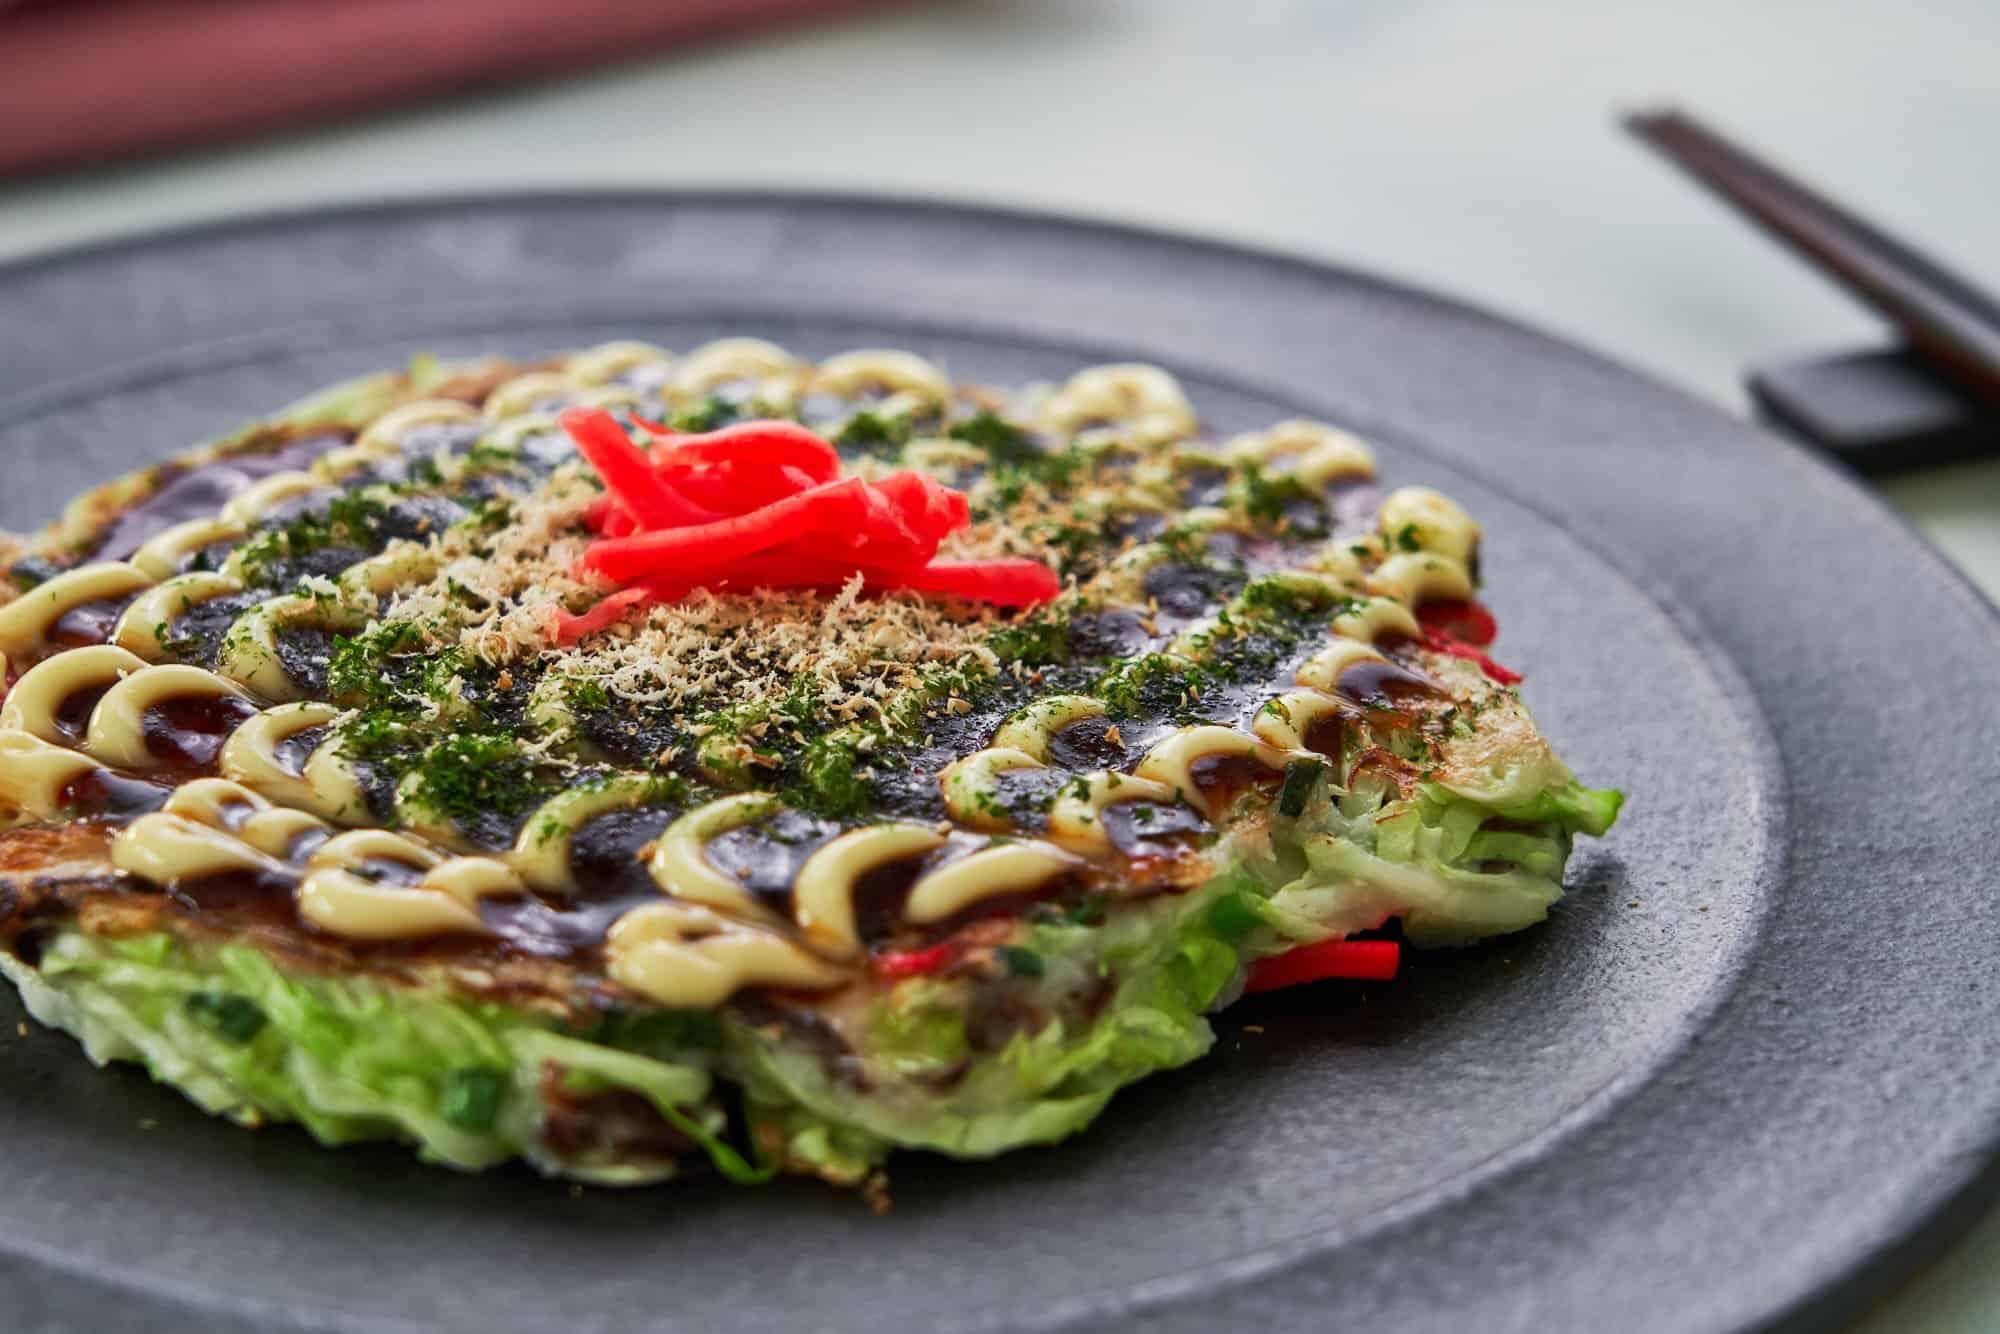 Vegan Okonomiyaki slathered in okonomiyaki sauce, plant-based mayonnaise, aonori, and dried shiitake mushroom flakes.